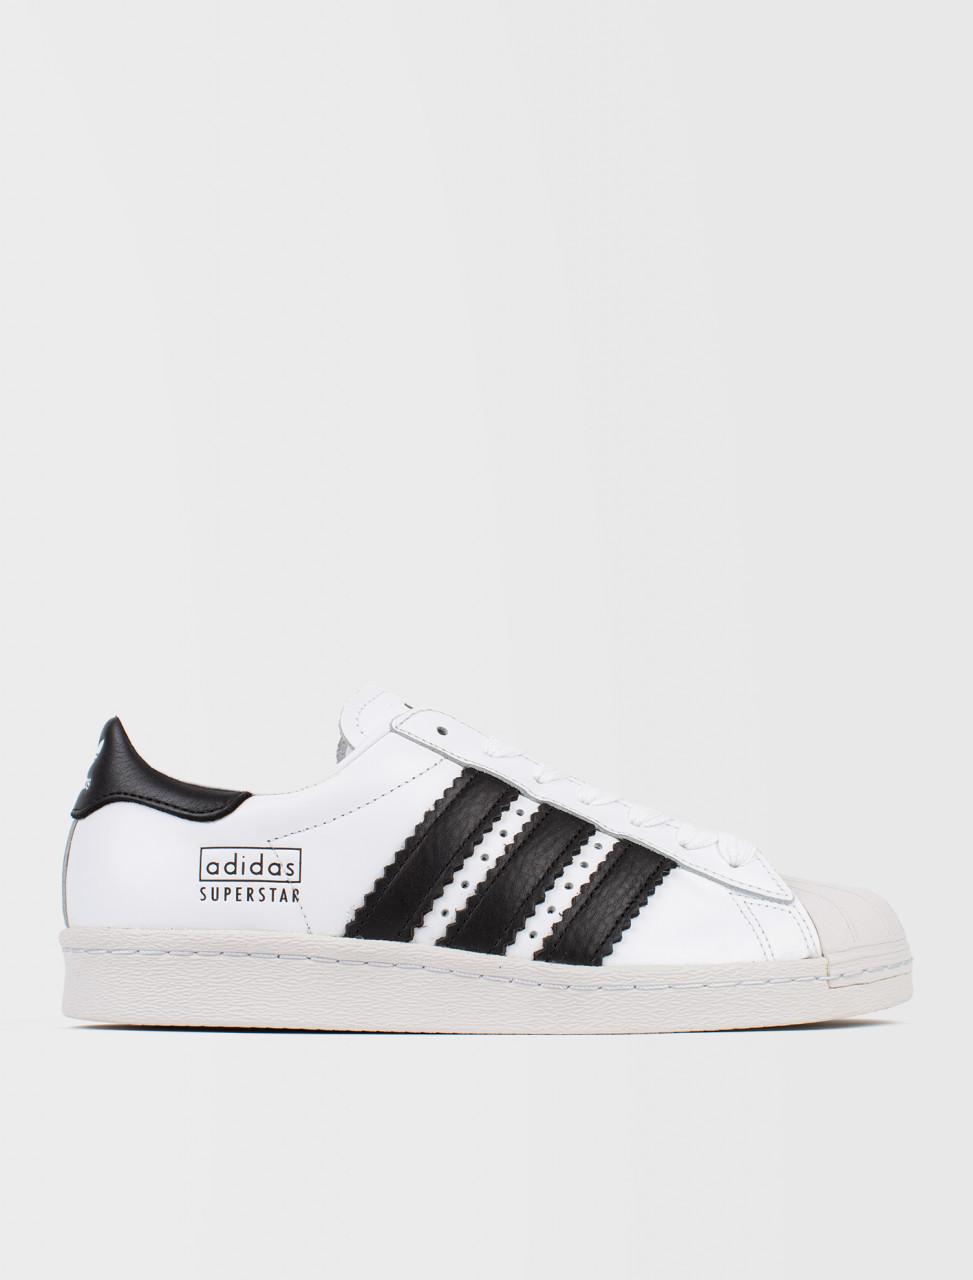 7ee980ed2d591 Adidas Superstar 80s Sneaker